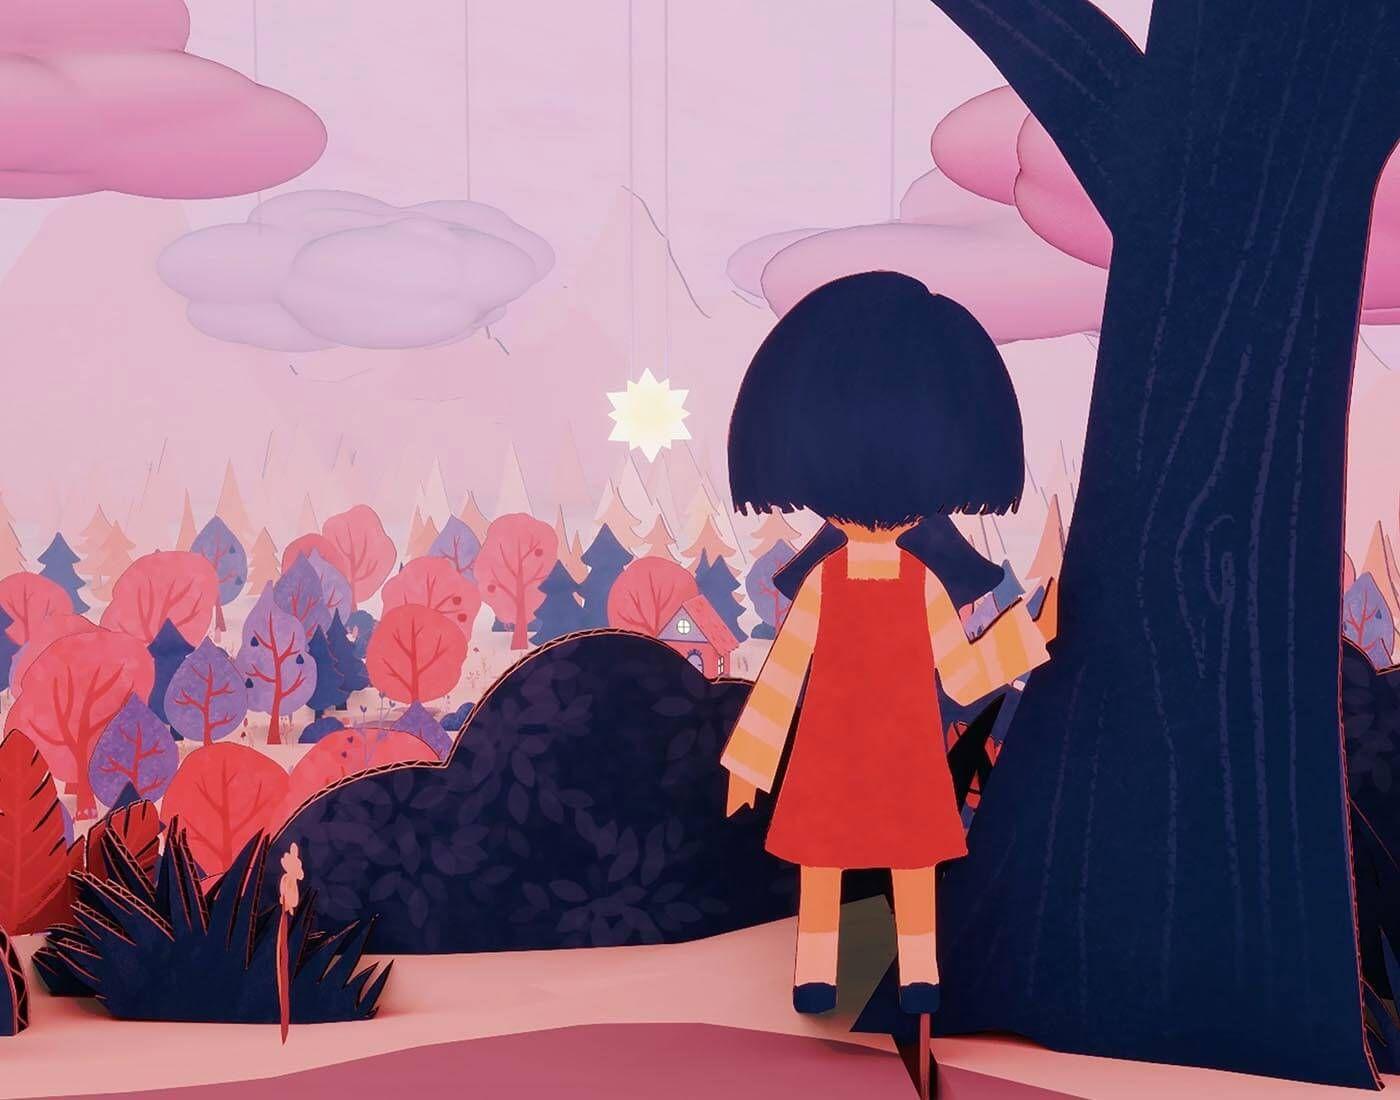 Mandy Burton, BA (Hons) Animation, UCA Farnham